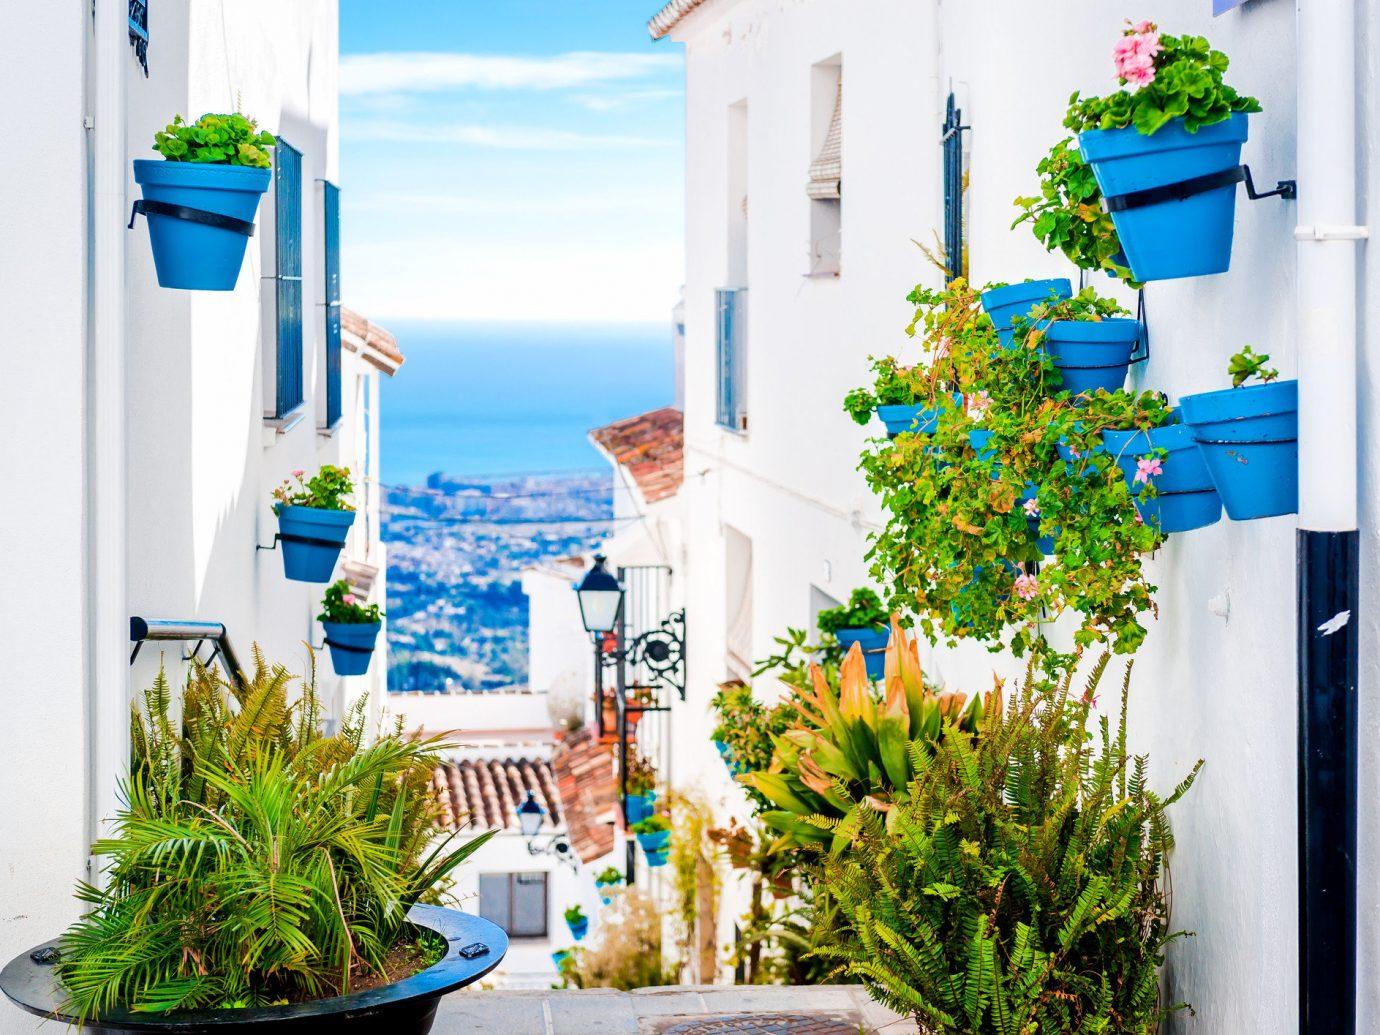 Road Trips Trip Ideas plant blue home flower house Balcony facade interior design apartment porch